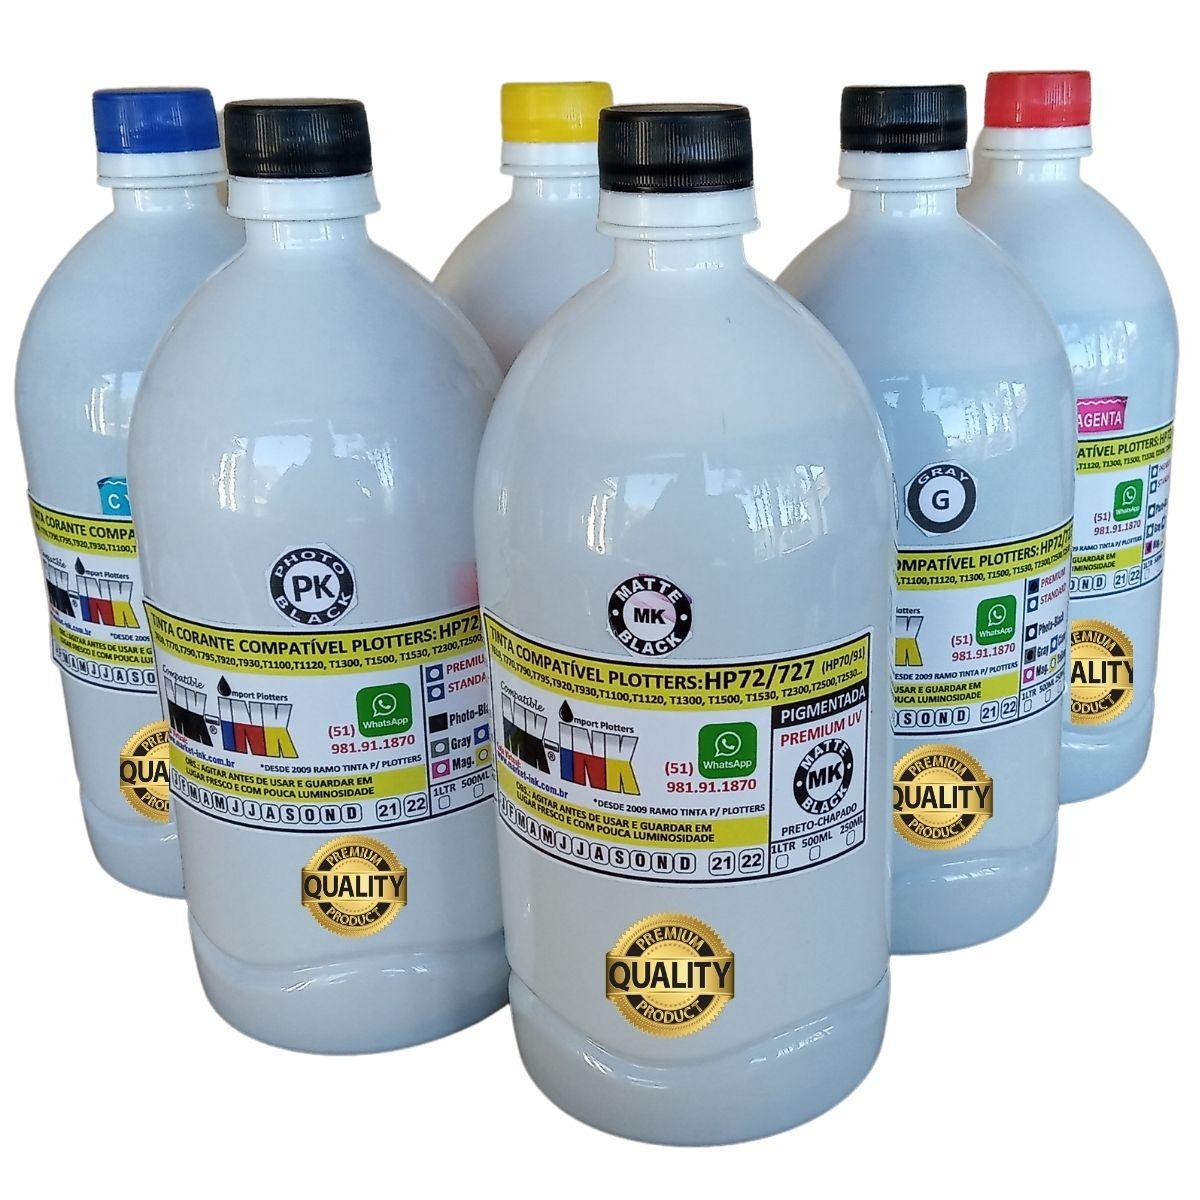 Jogo 6 litros Tinta Premium 6 cores Plotter código HP72, HP727 exclusiva p/ Plotter HP T610, T770, T790, T795,T920, T1100, T1120, T1200, T1300, T1500, T2300, T2500